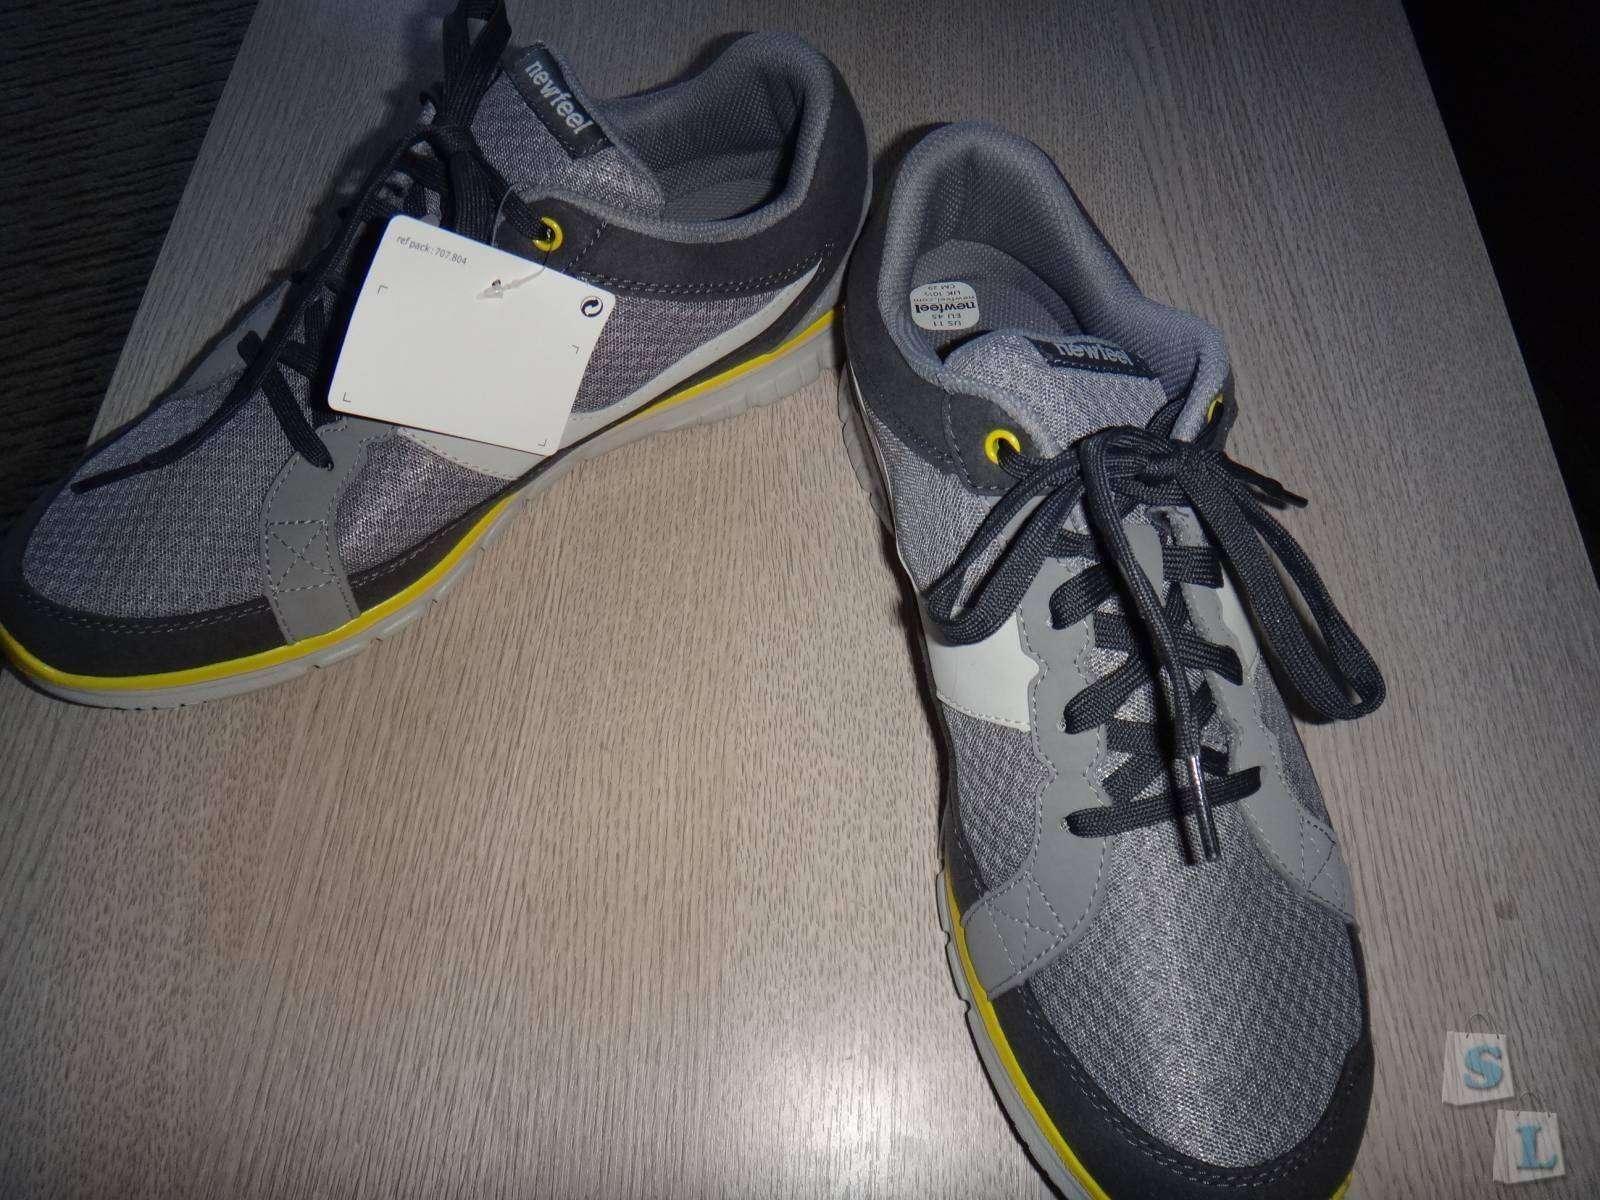 Decathlon: Обзор летних мужских кроссовок NEWFEEL из магазина Декатлон